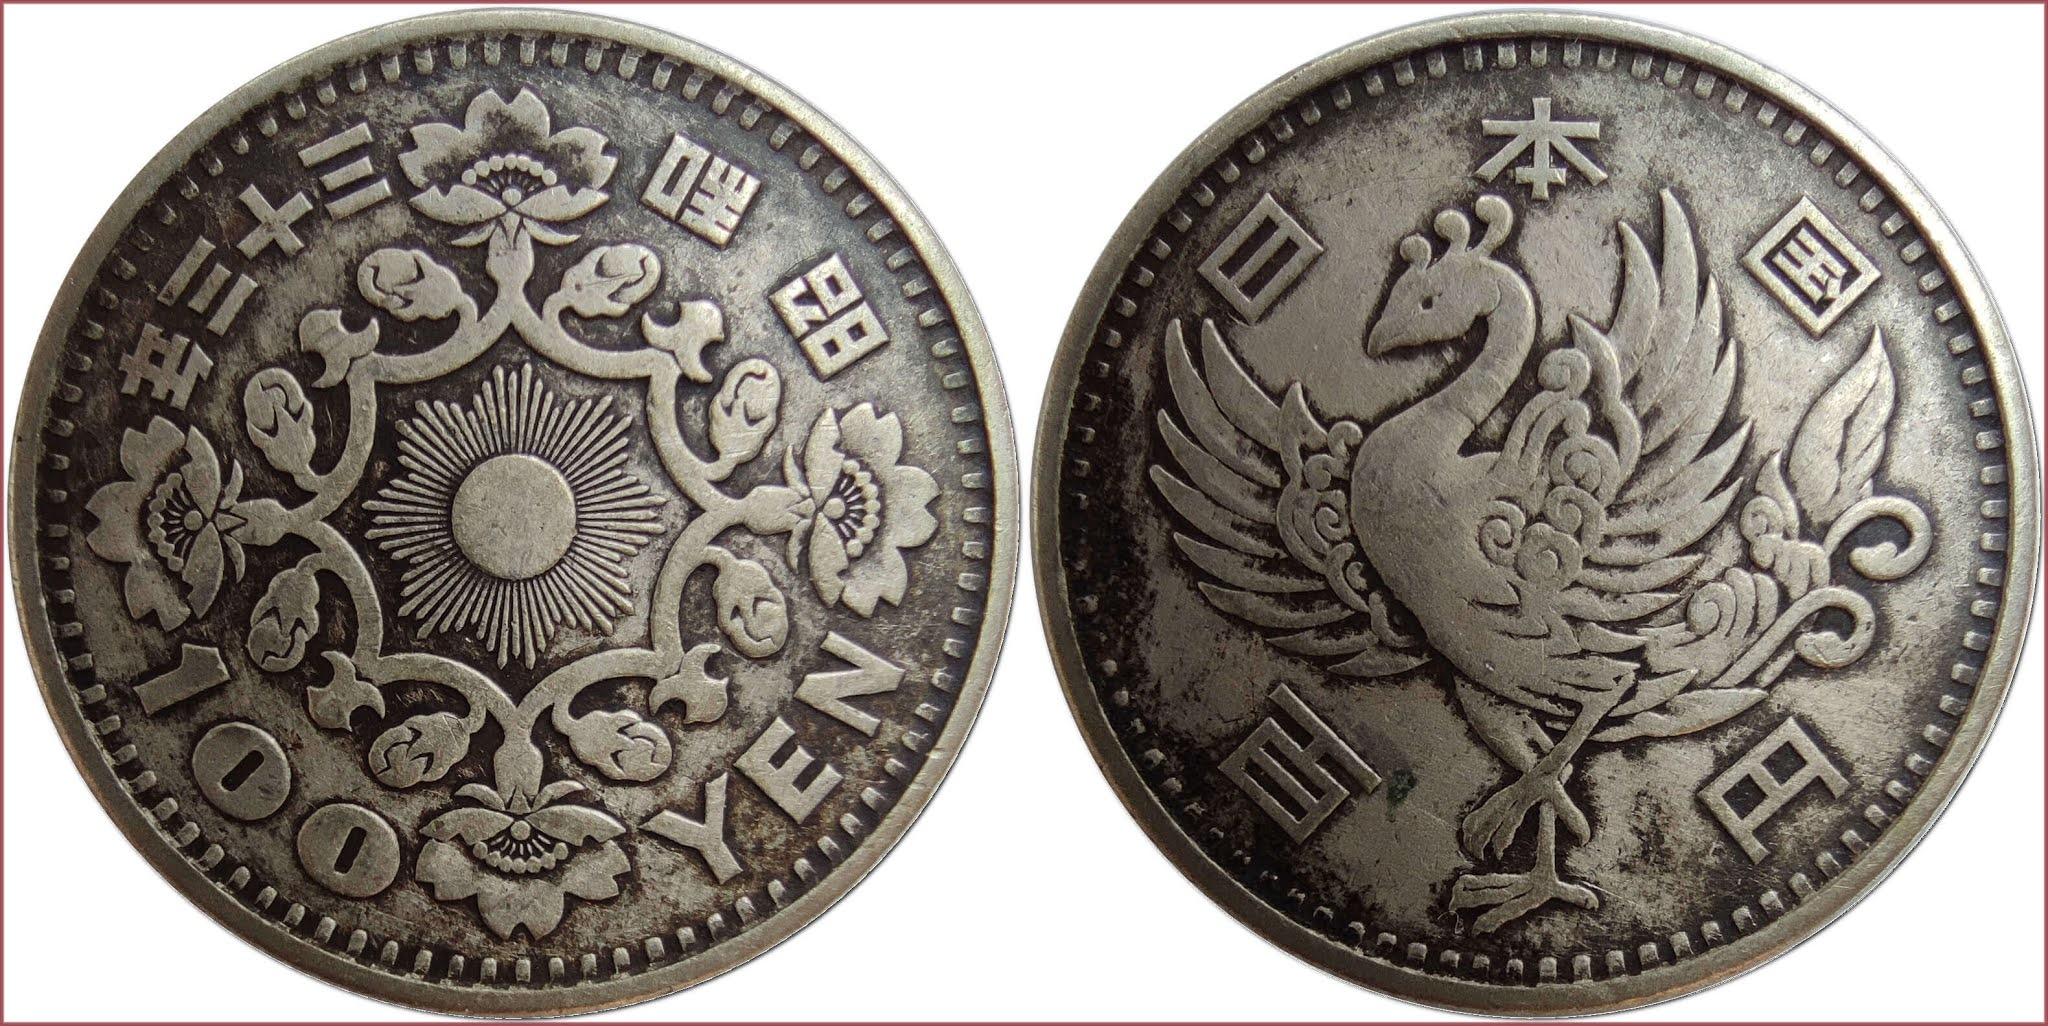 100 yen (円), 1958: Japan